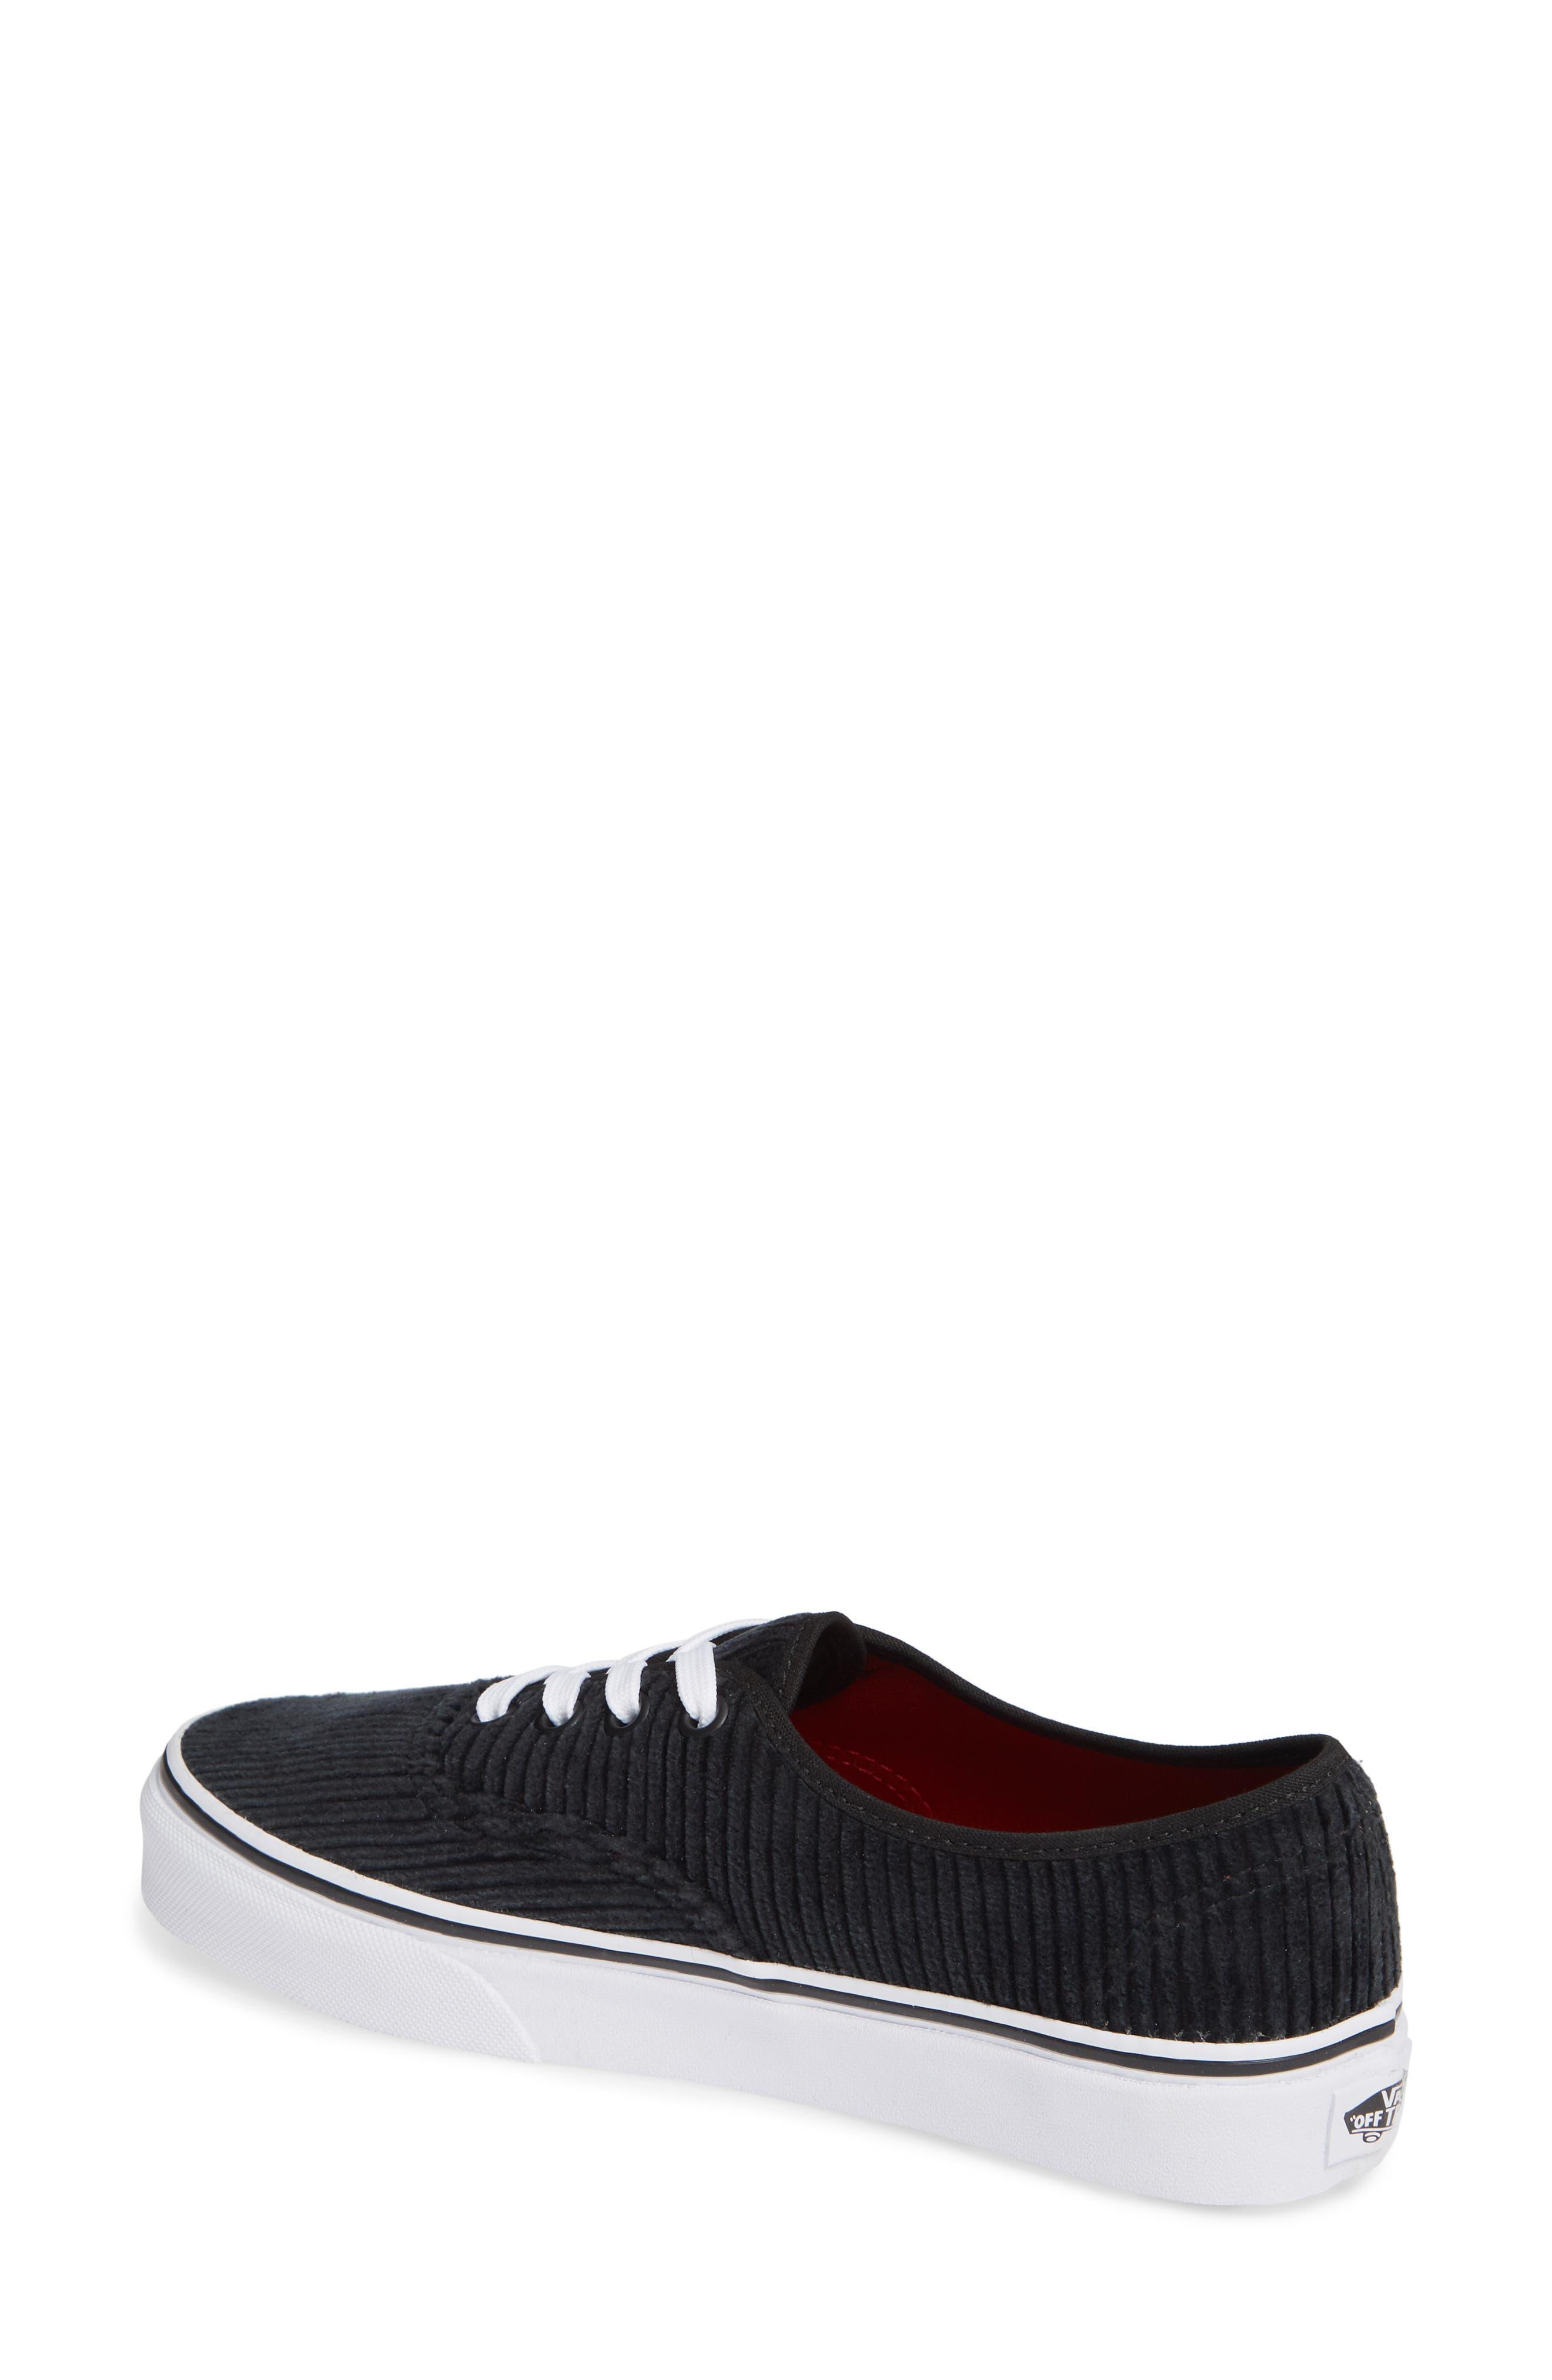 UA Authentic Design Assembly Sneaker,                             Alternate thumbnail 2, color,                             BLACK/ TRUE WHITE